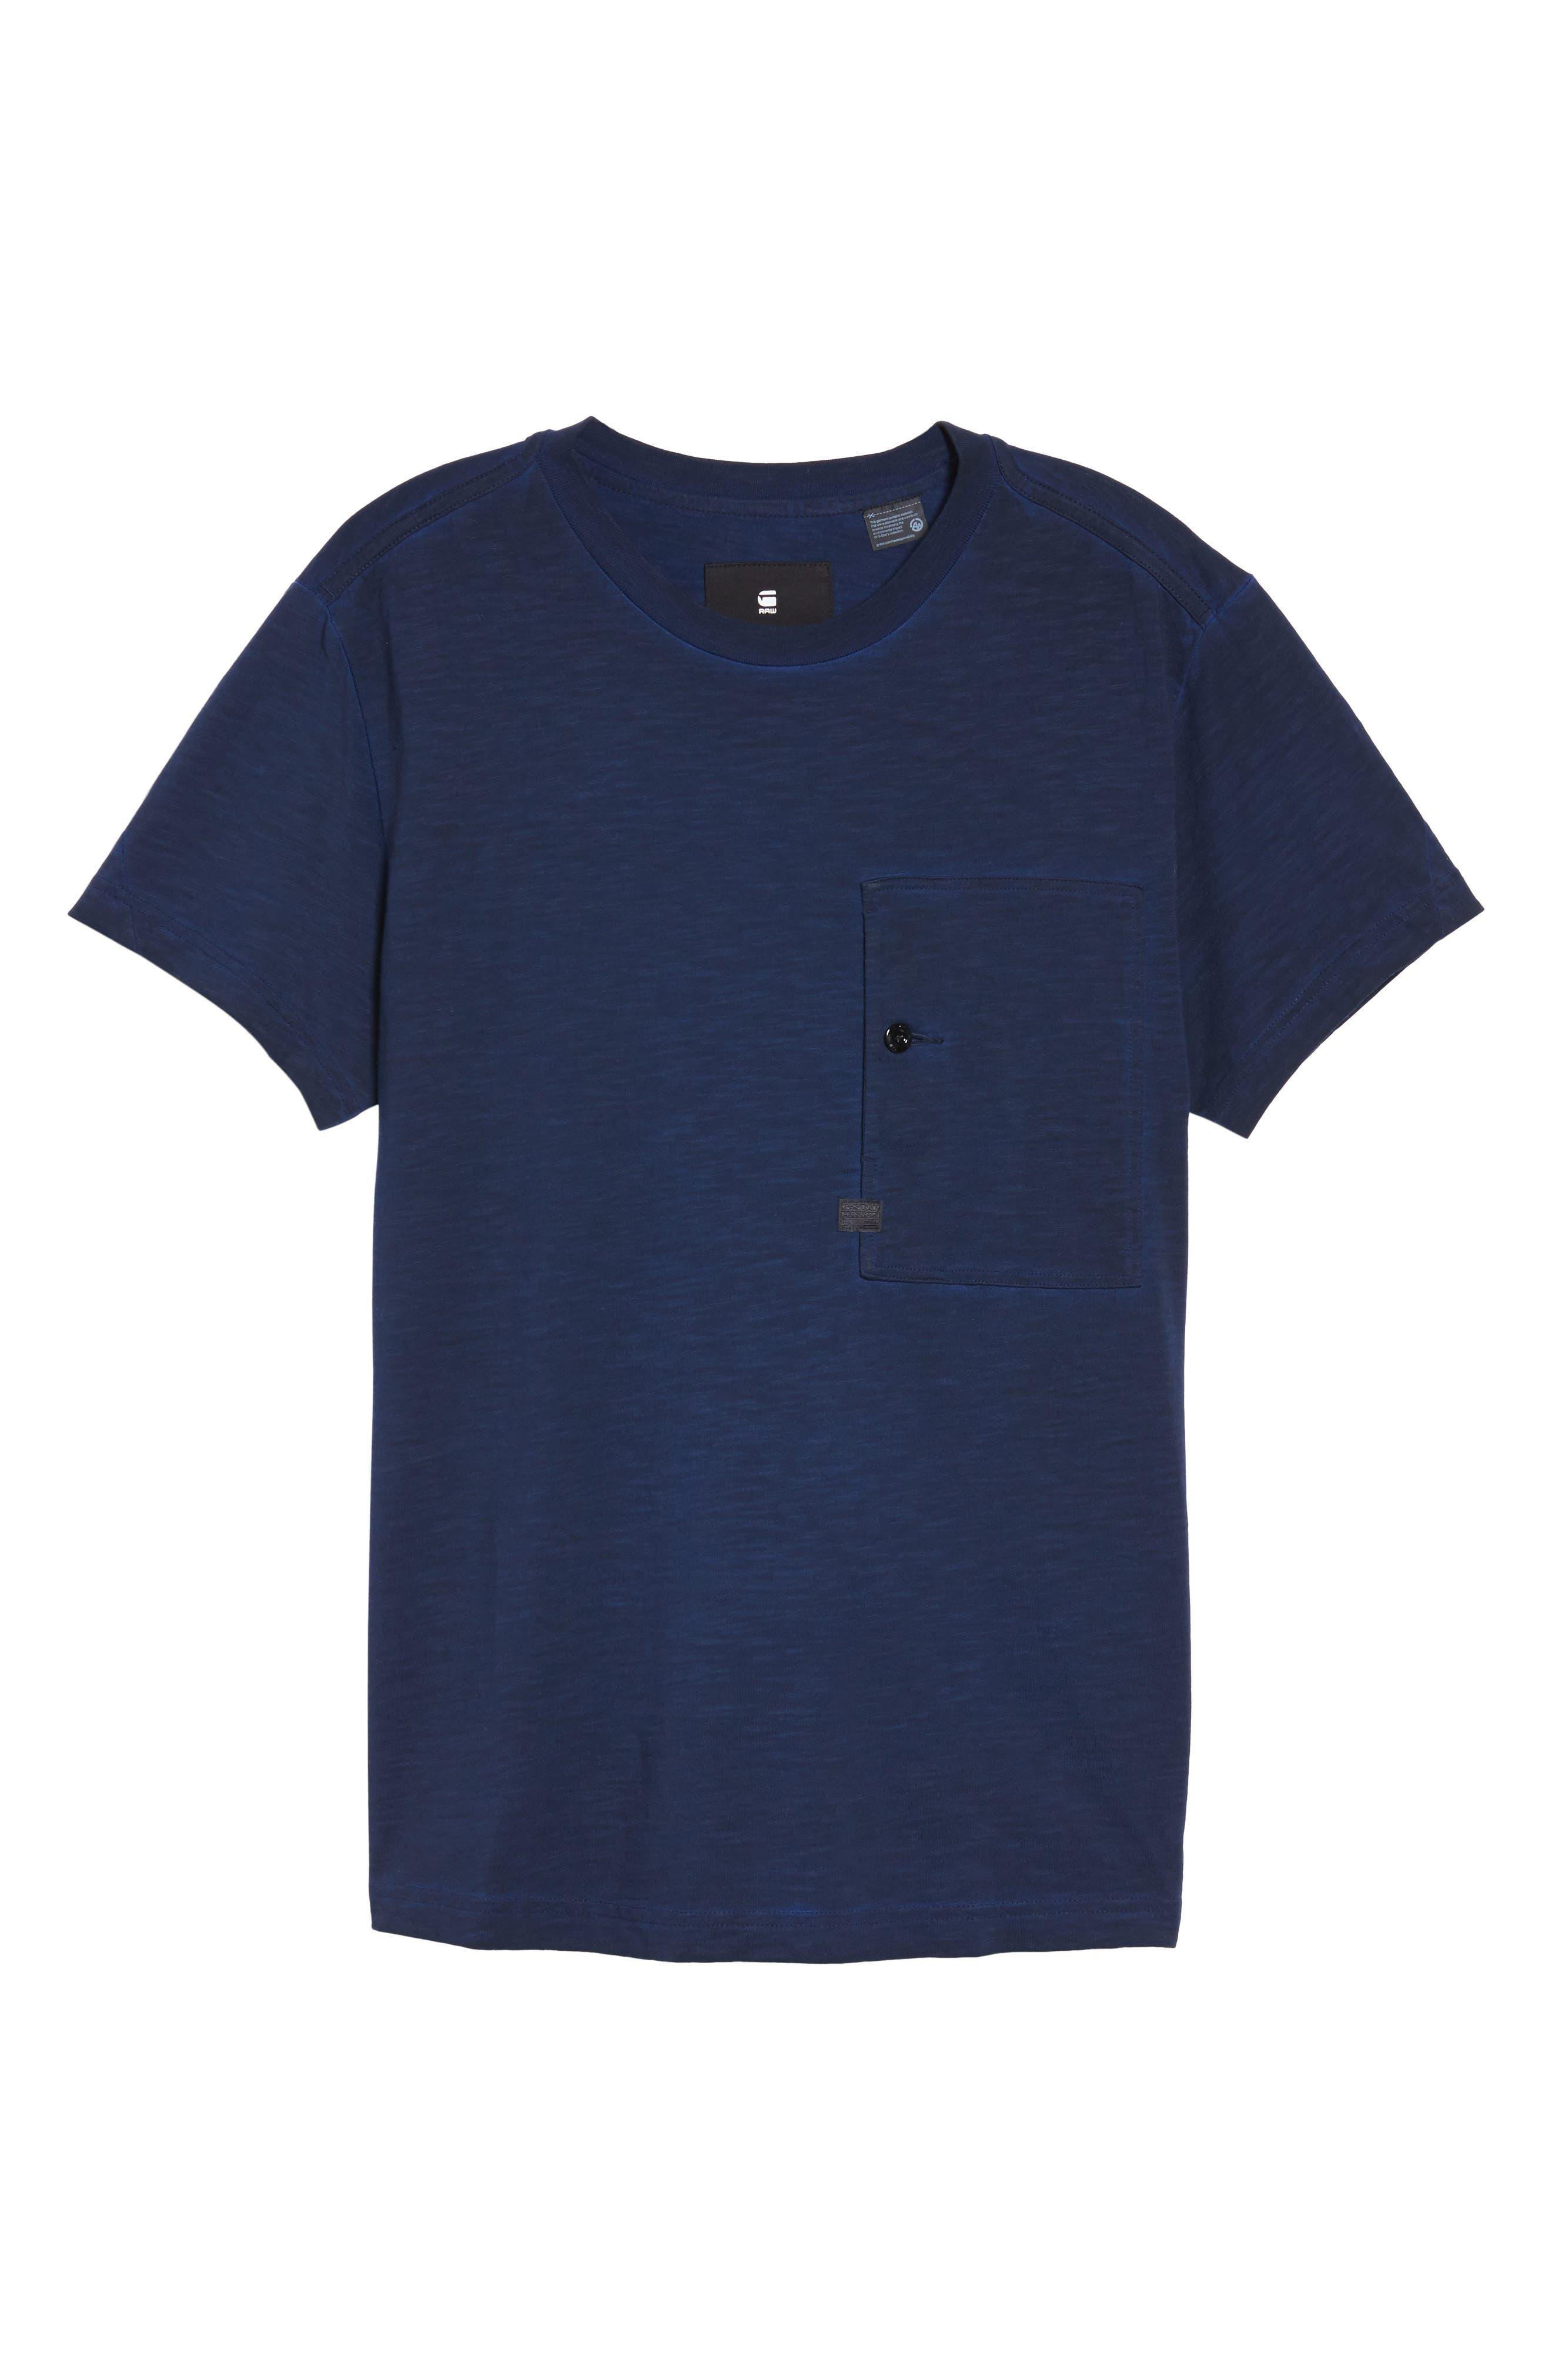 Stalt Pocket T-Shirt,                             Alternate thumbnail 6, color,                             400